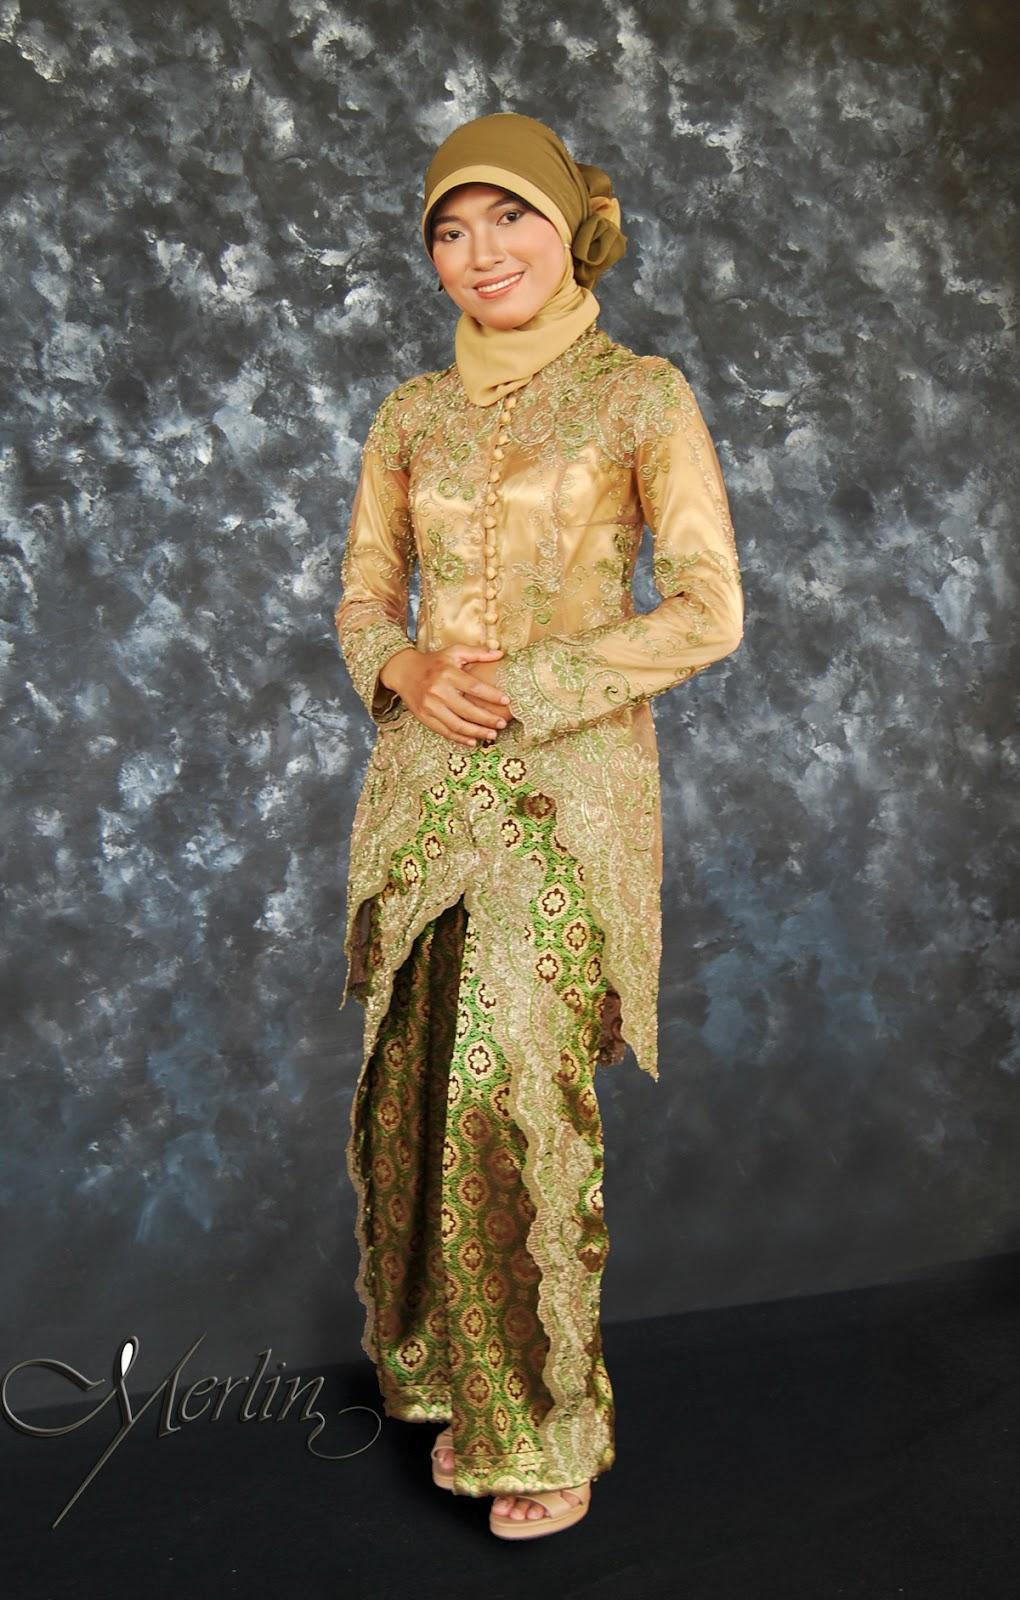 ... kebaya pengantin wisuda gamis seragam kantor sekolah bustier kamisol